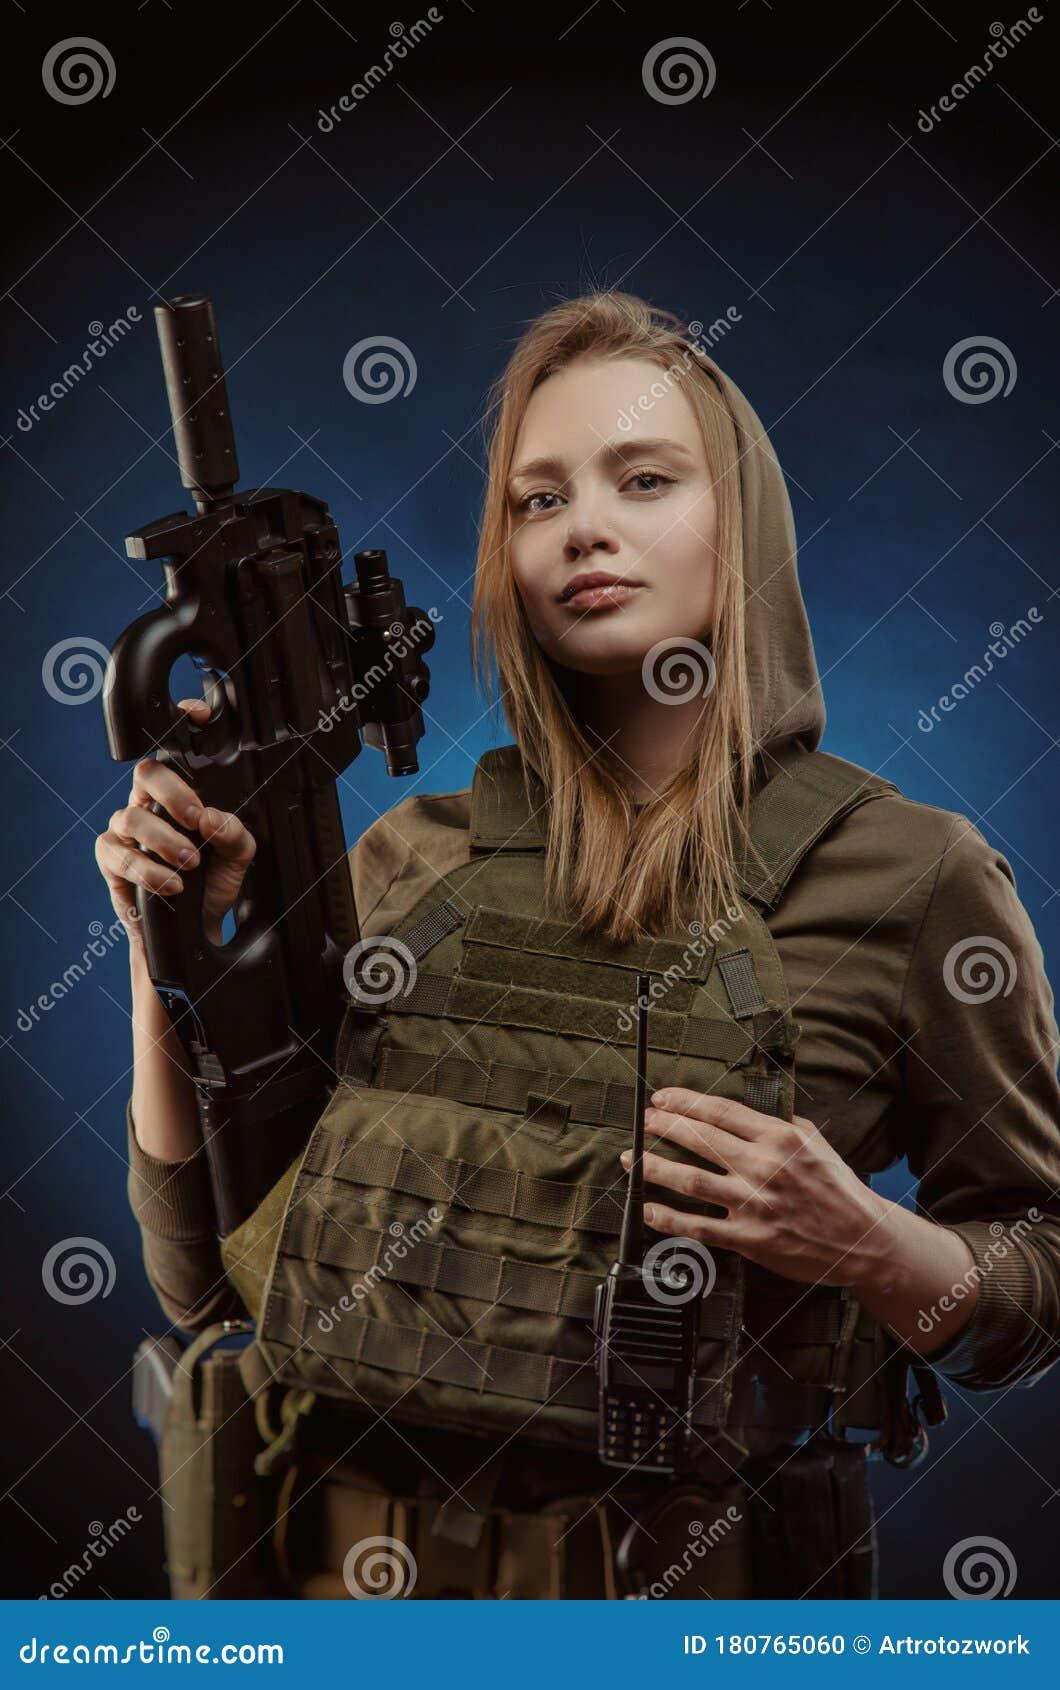 Woman Holding Gun Royalty Free Stock Photography - Image